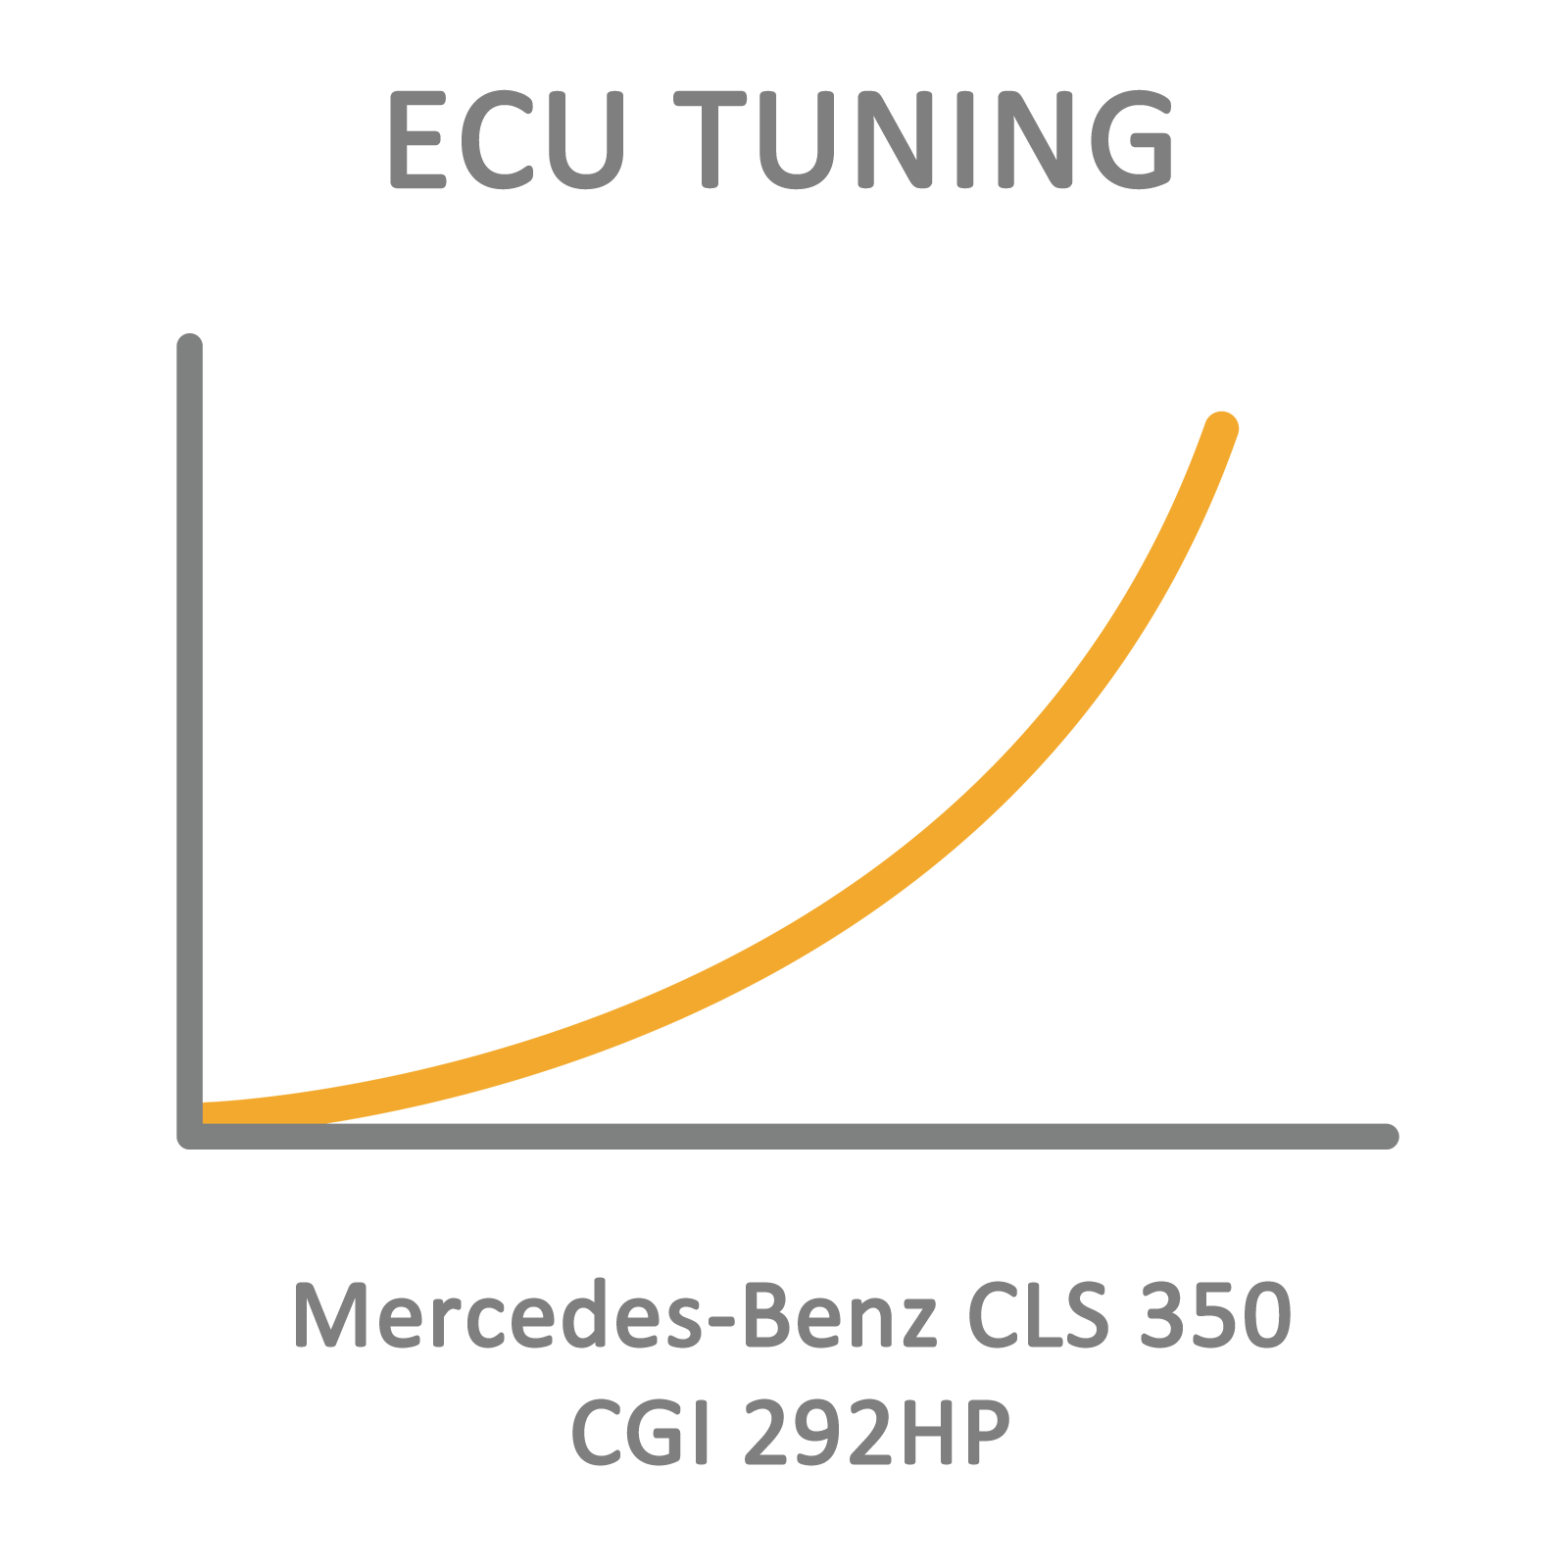 Mercedes-Benz CLS 350 CGI 292HP ECU Tuning Remapping